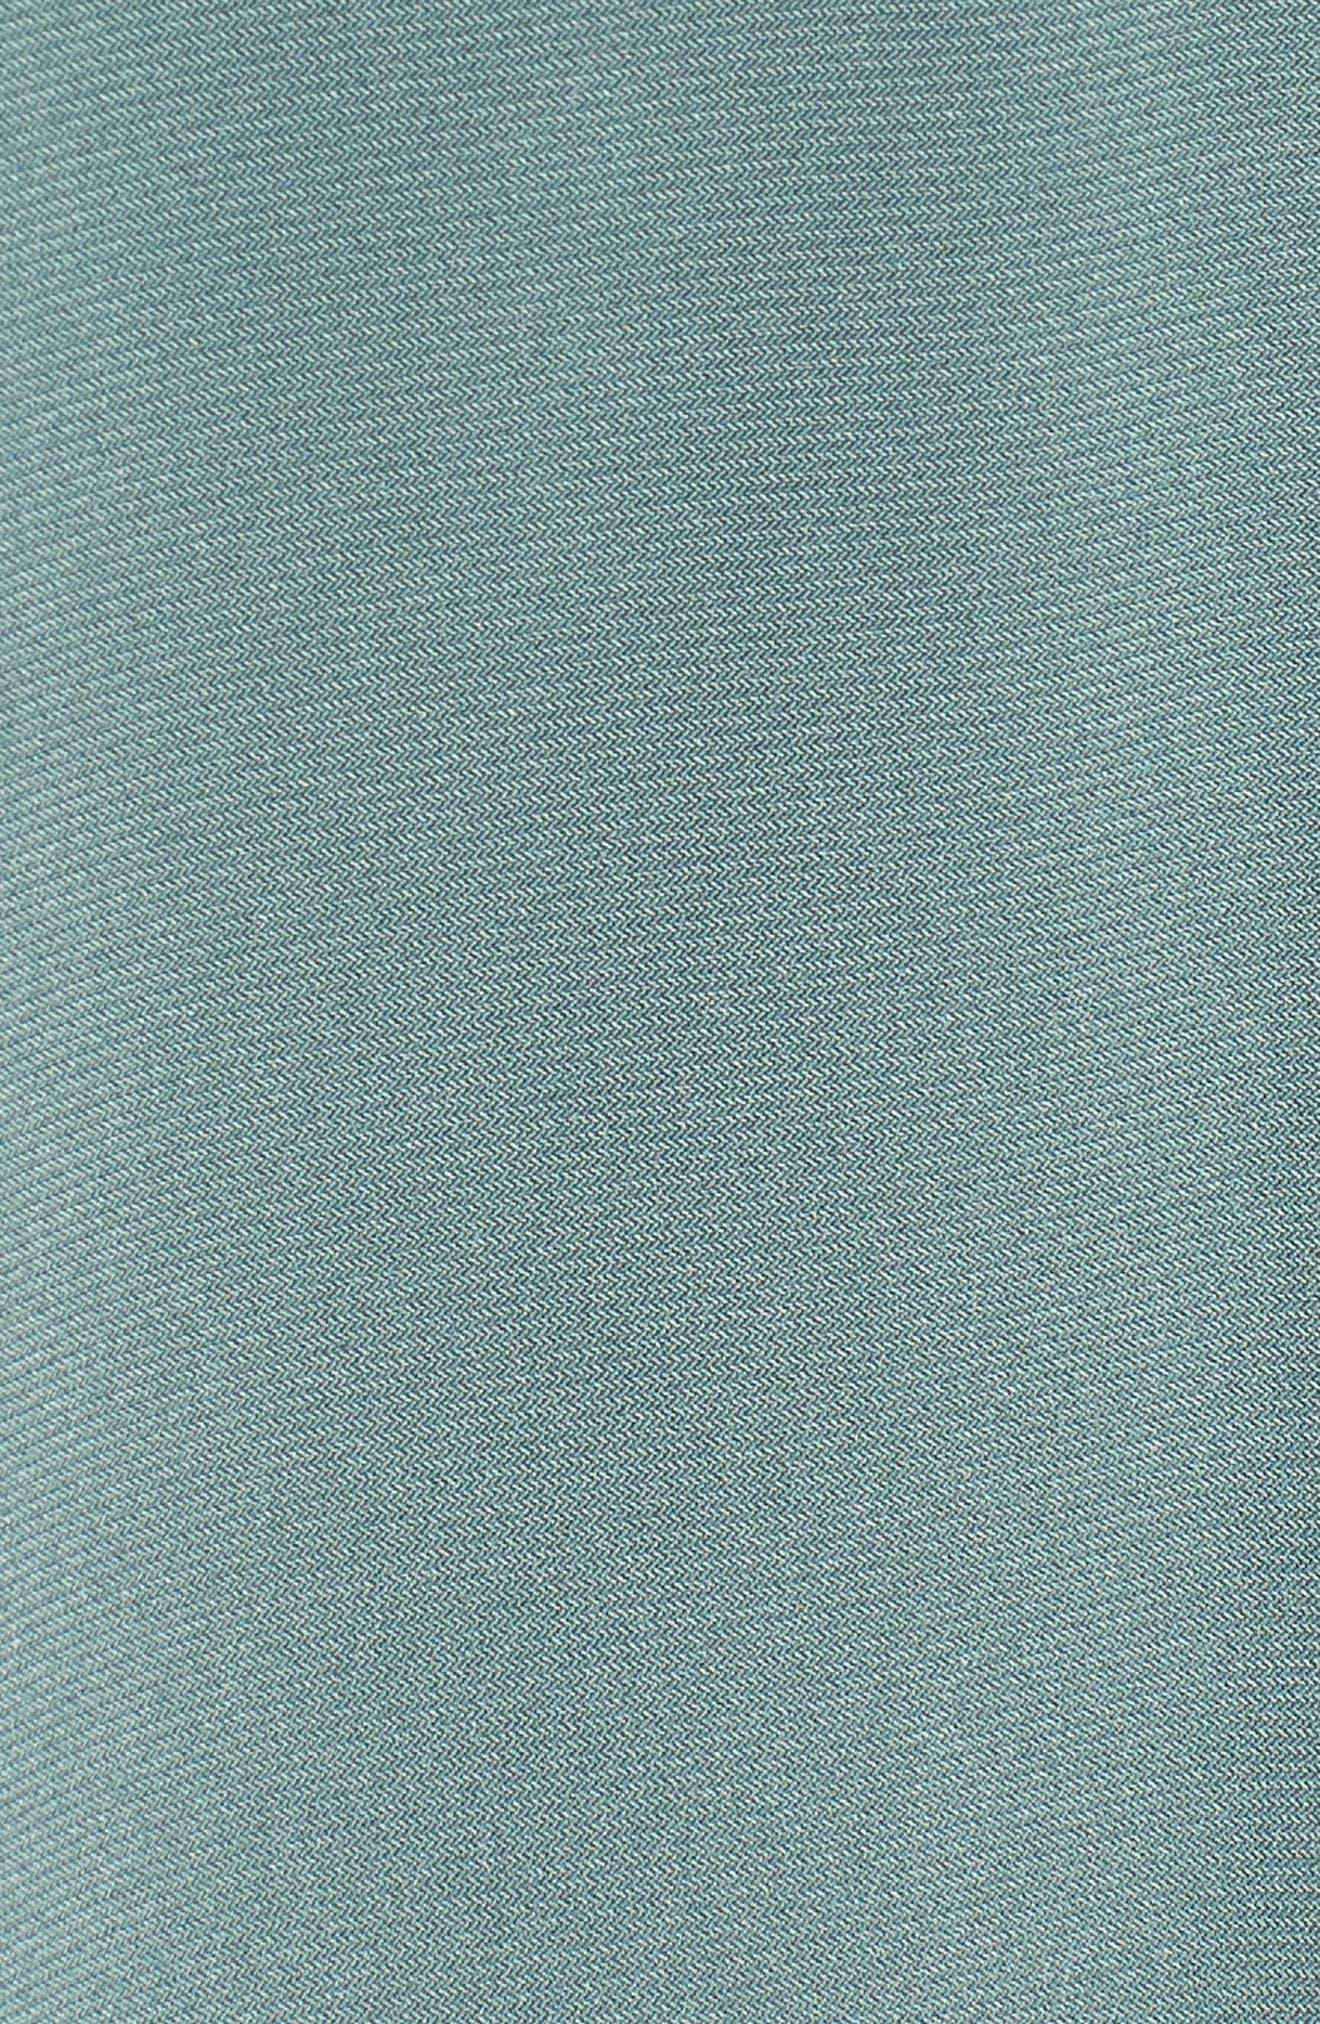 Tie Waist Maxi Dress,                             Alternate thumbnail 5, color,                             738-Tropic Moss